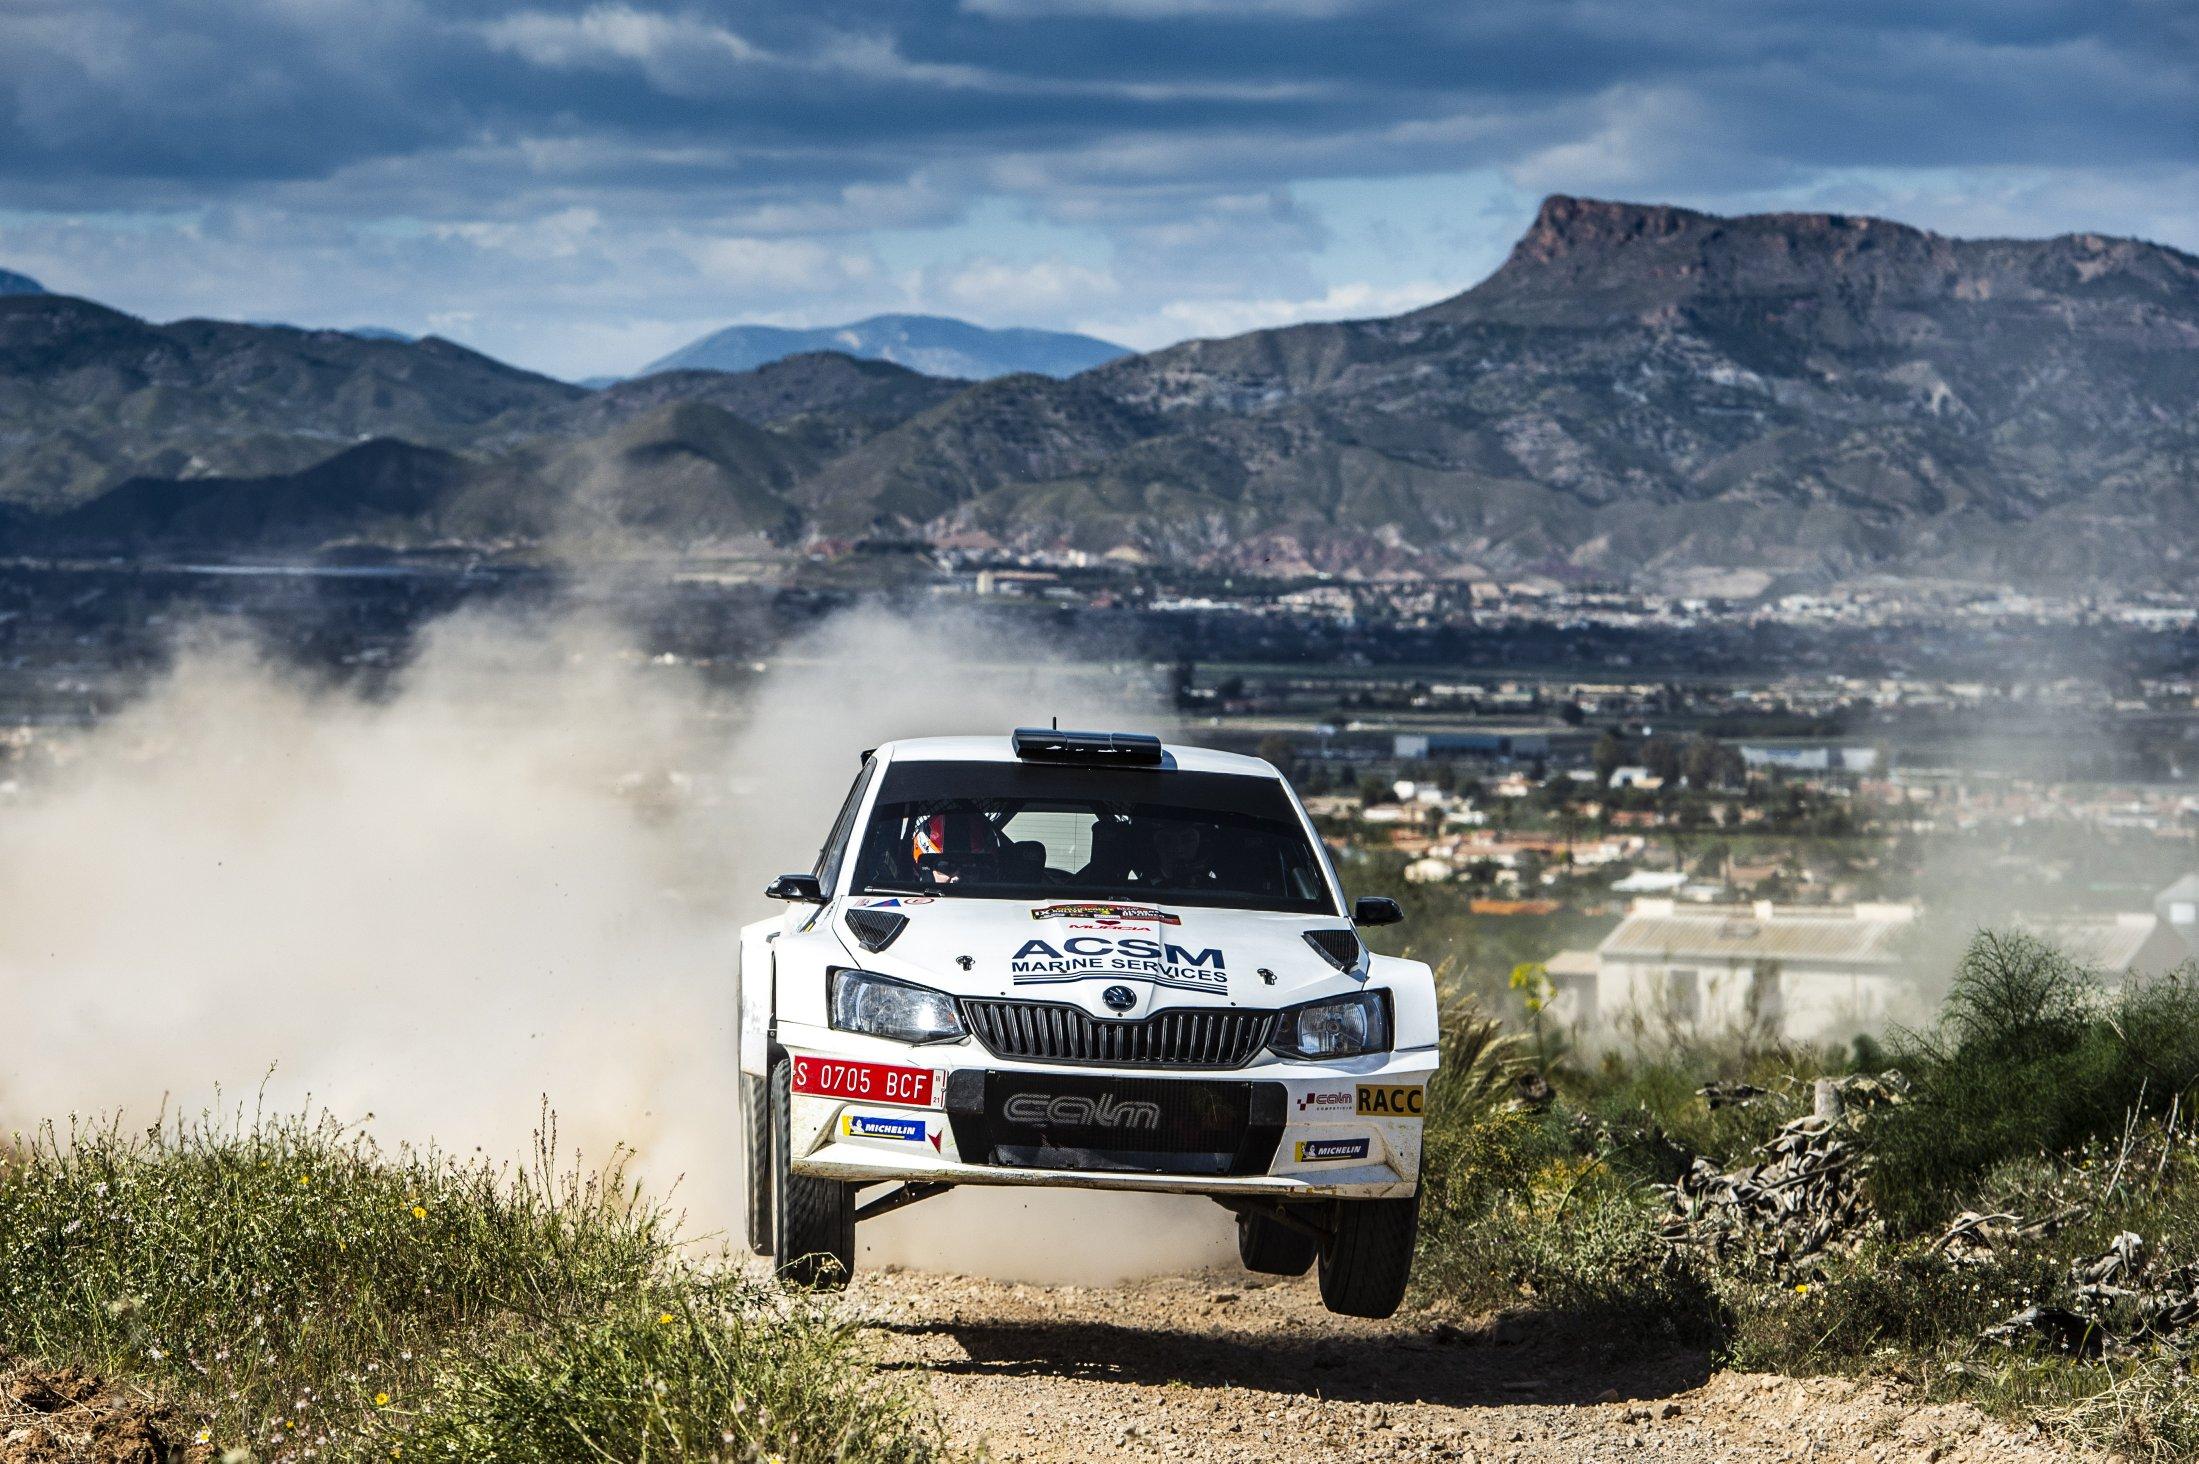 SCER + CERT: IX Rallye Tierras Altas de Lorca [6-7 Marzo] - Página 2 EShd7gaWsAIj8cY?format=jpg&name=4096x4096